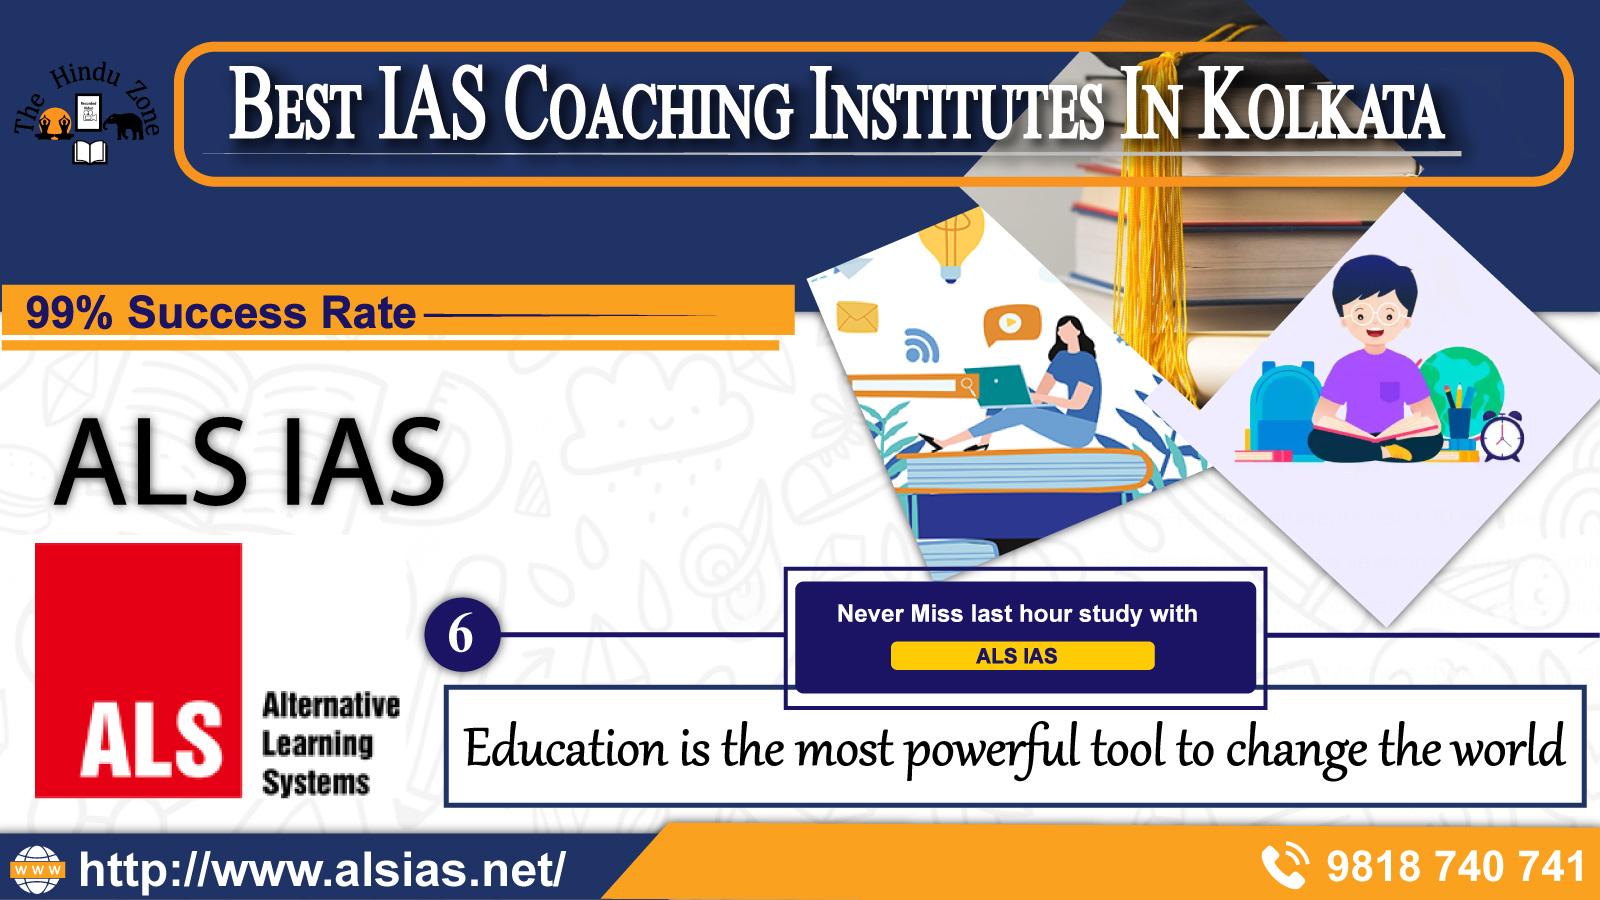 Top ias coaching Institute In Kolkata